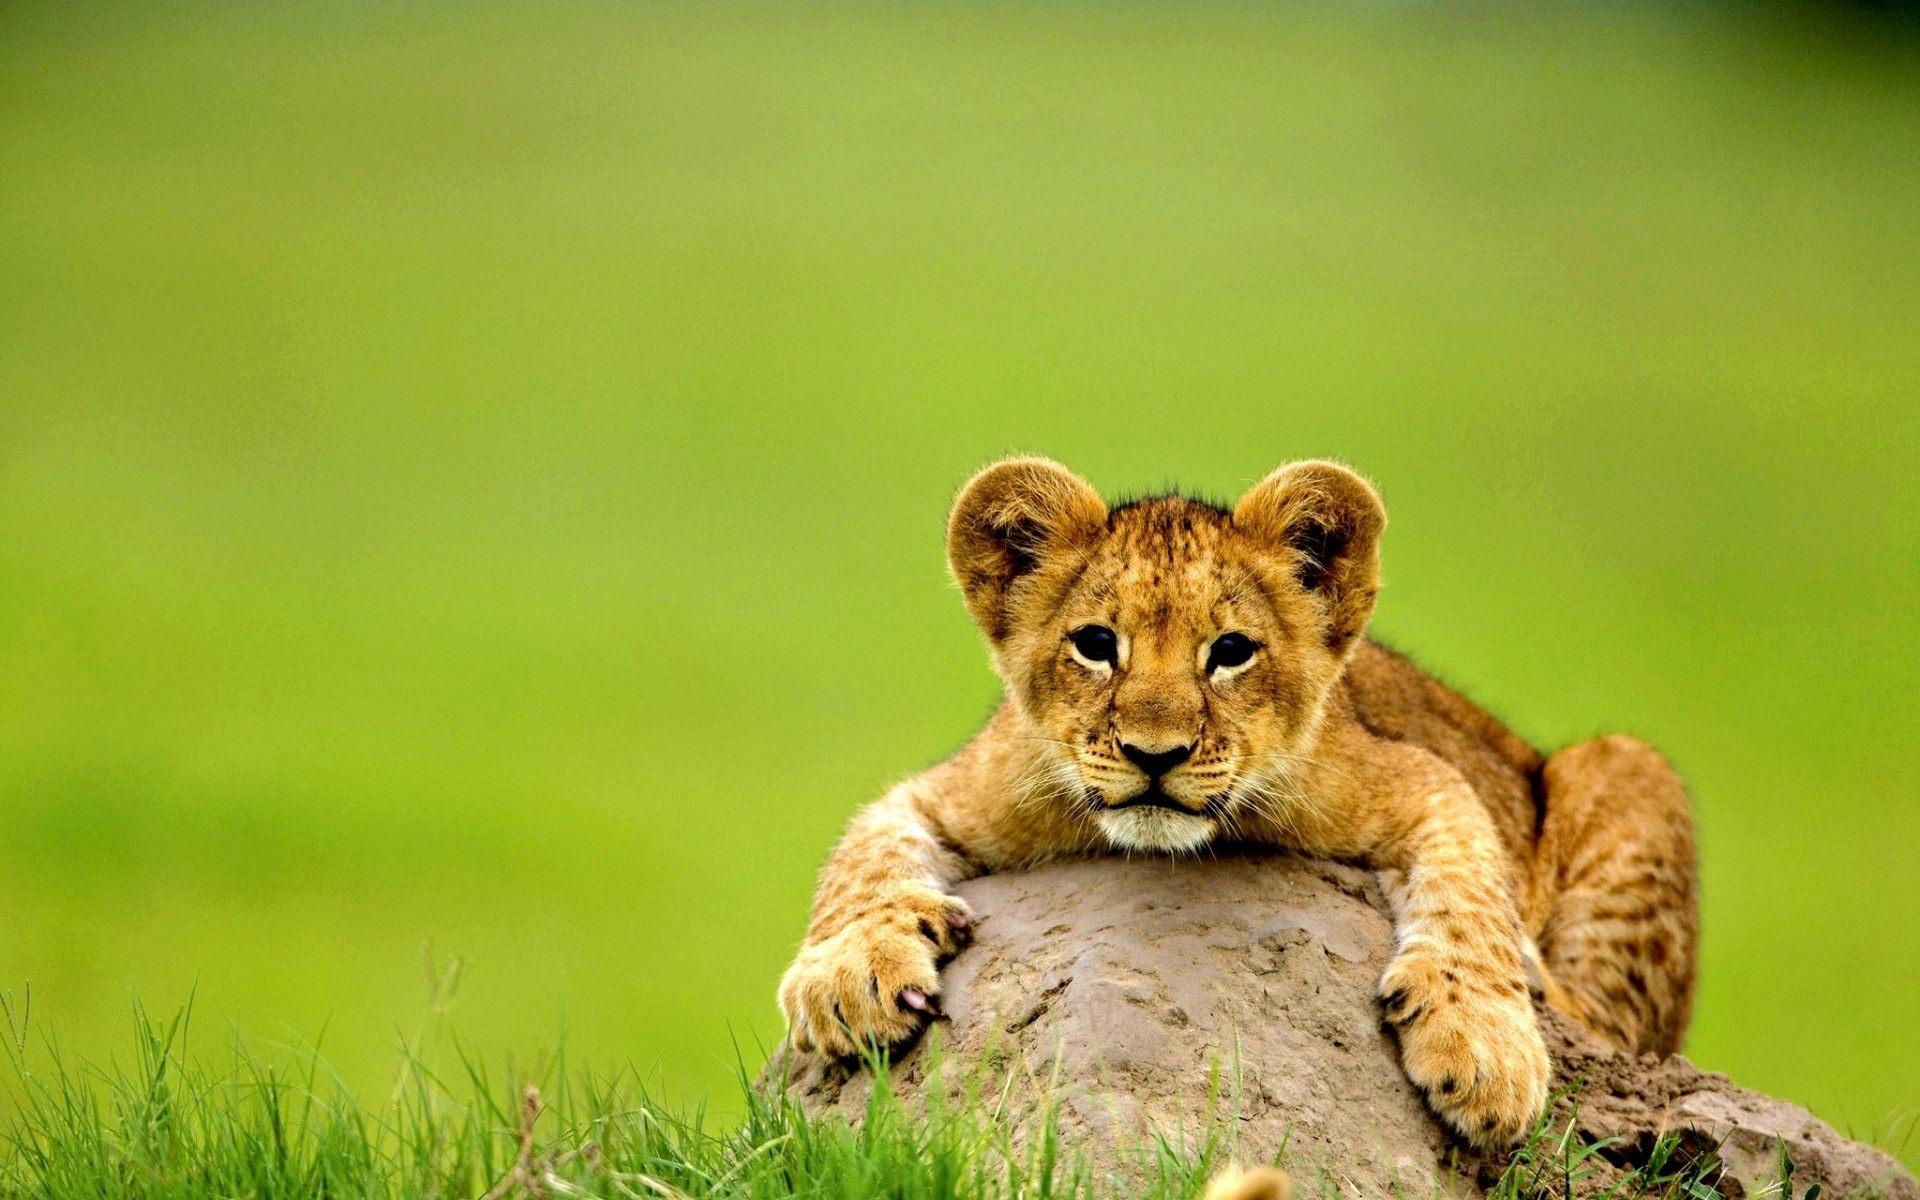 Cute lion baby animal wallpaper HD Wallpapers Rocks 1920x1200